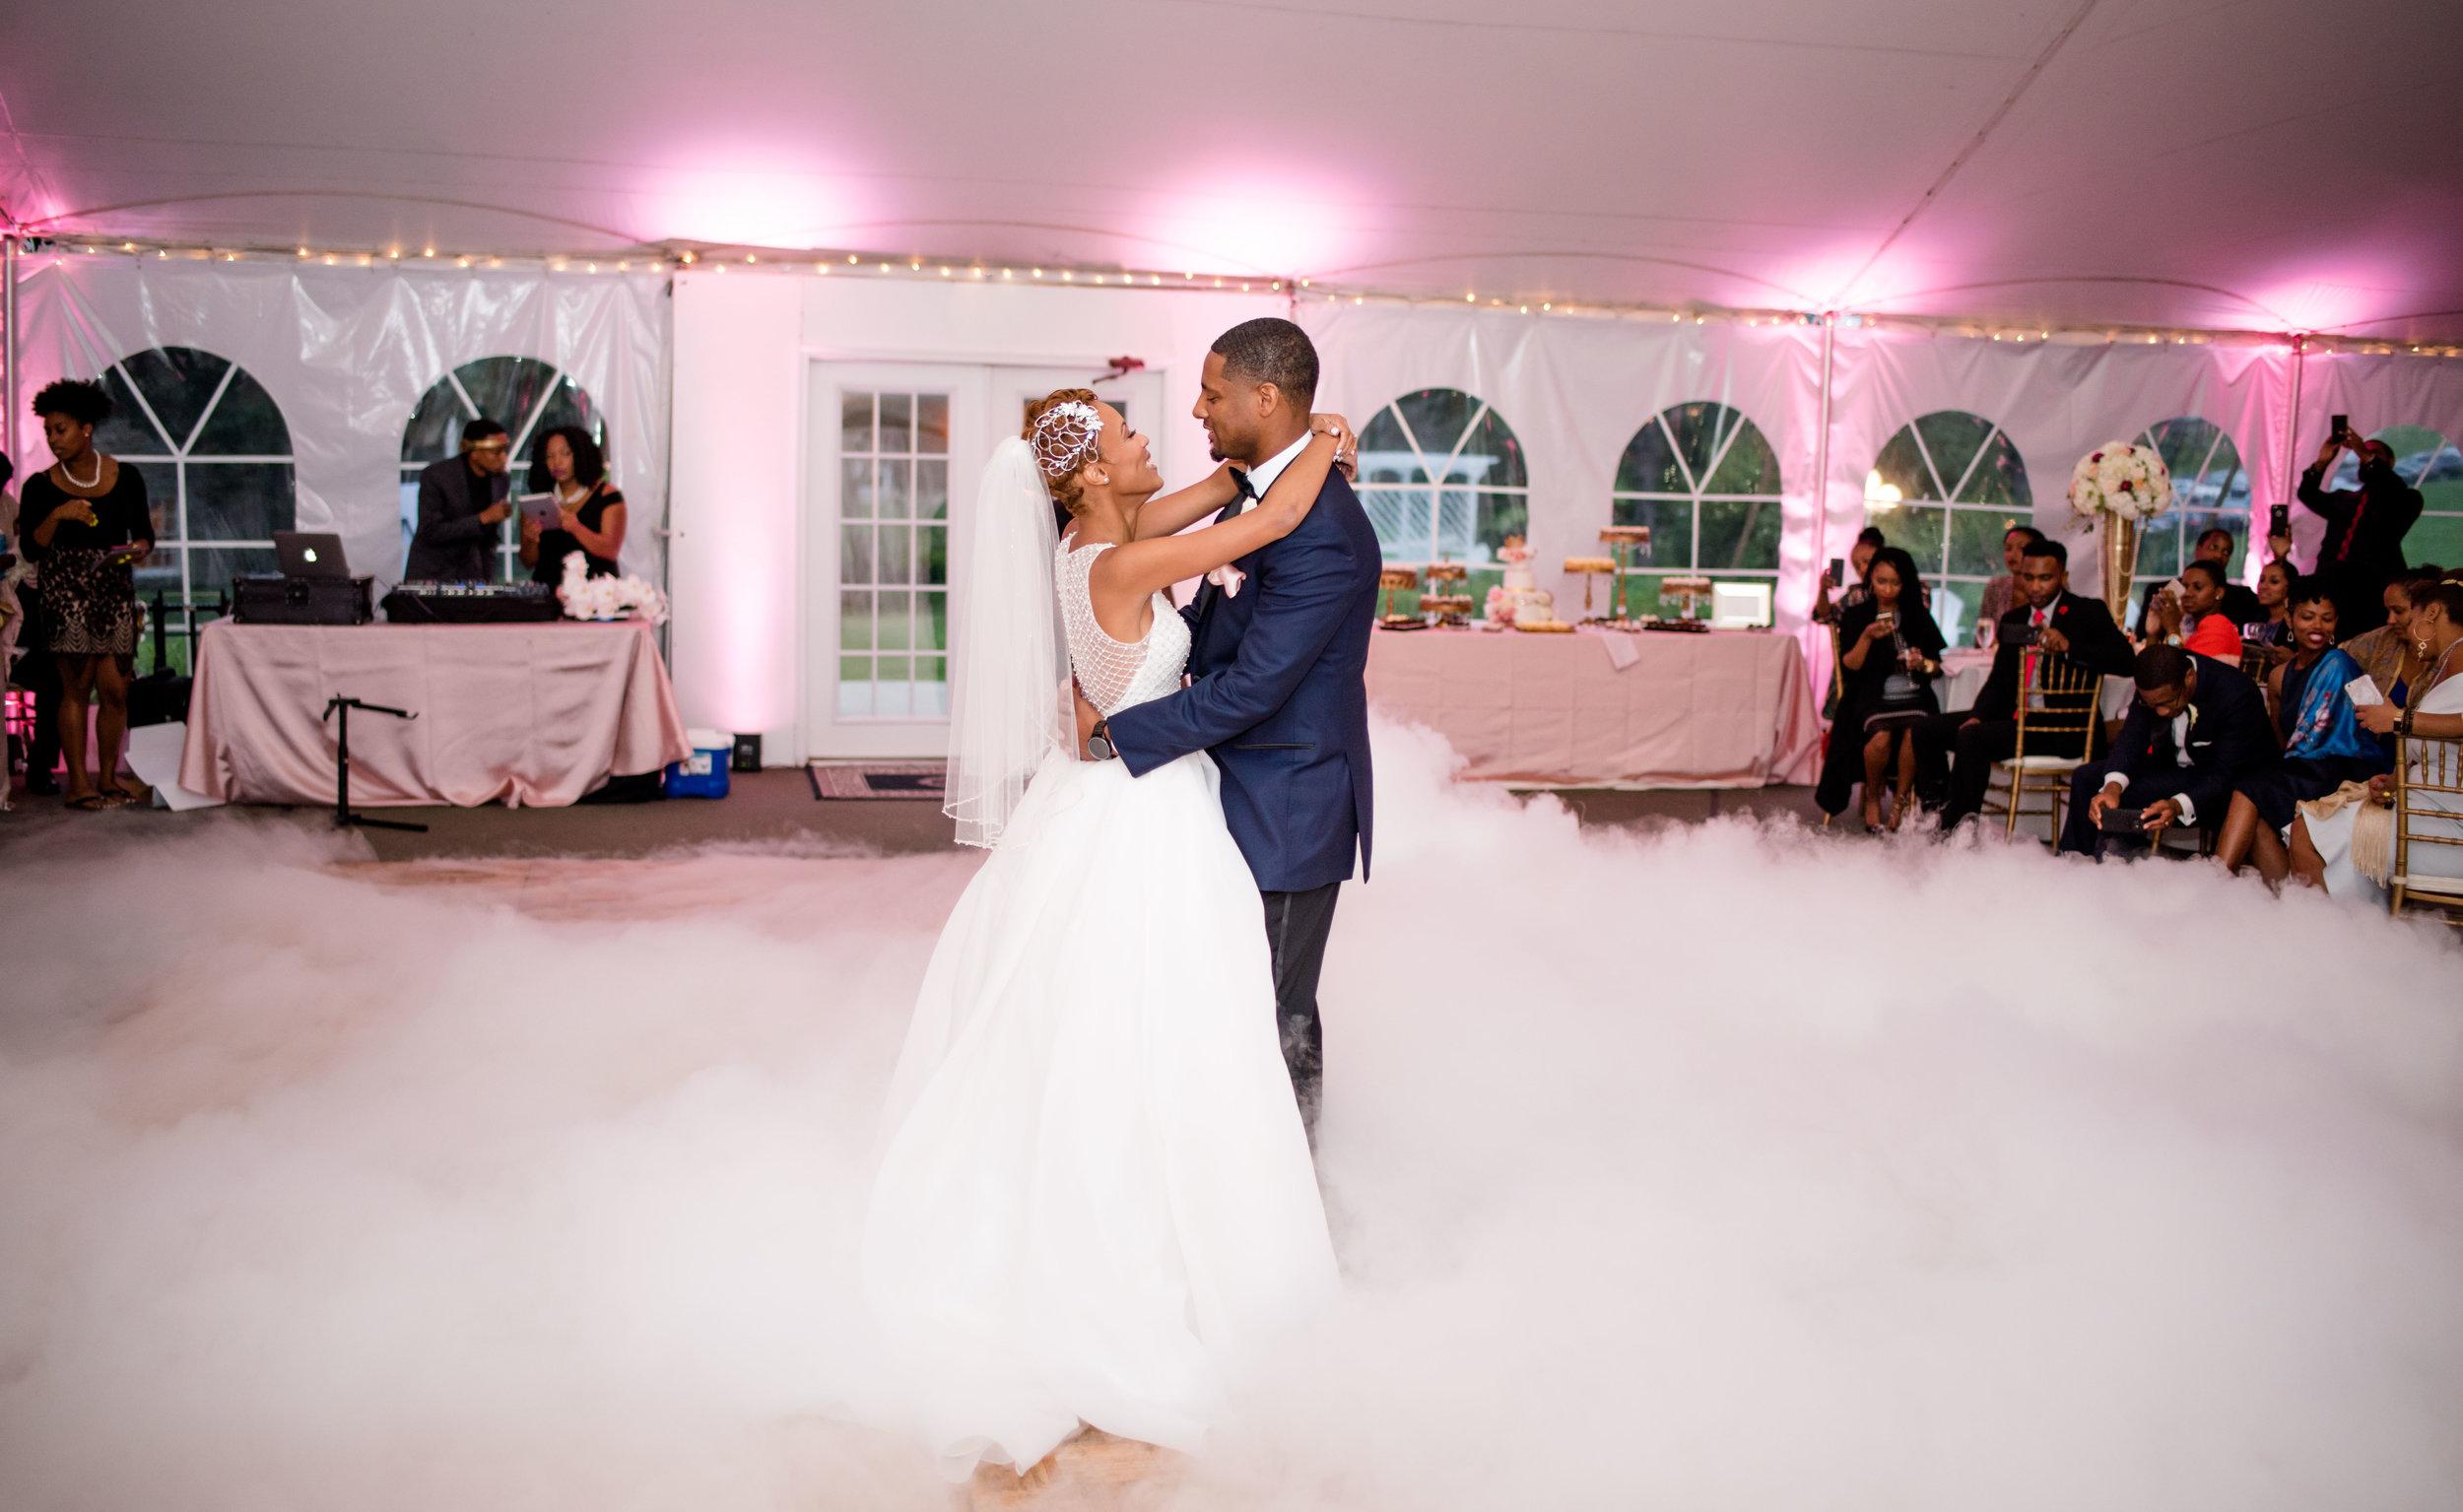 Chase Wedding - 2017-85.JPG